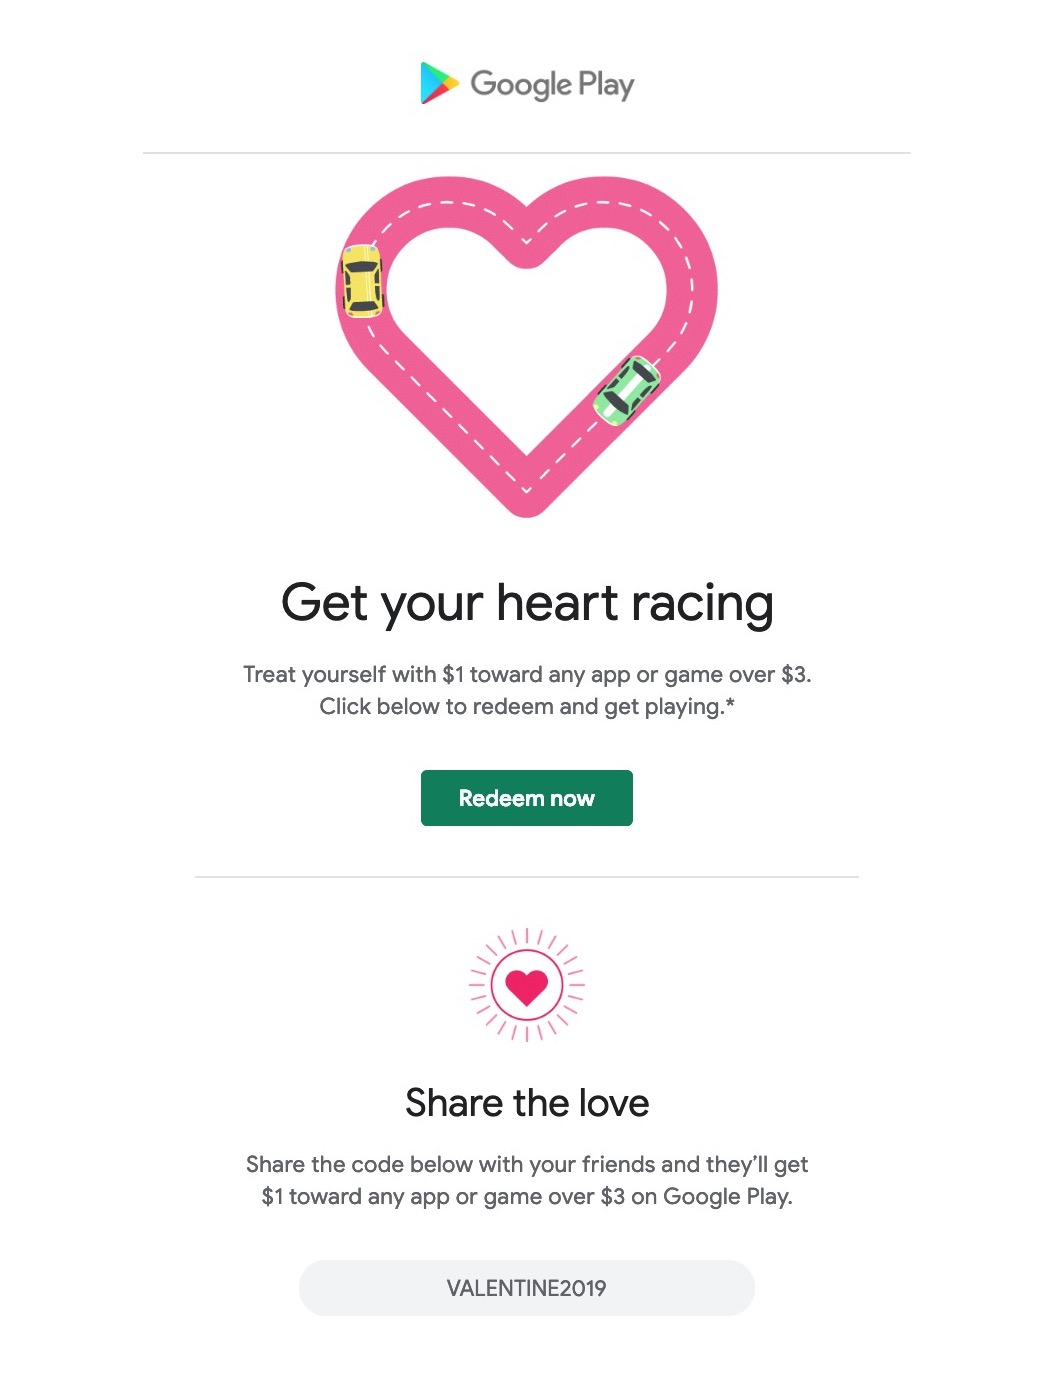 Google Play Store celebrating Valentine's Day promo - 9to5Google